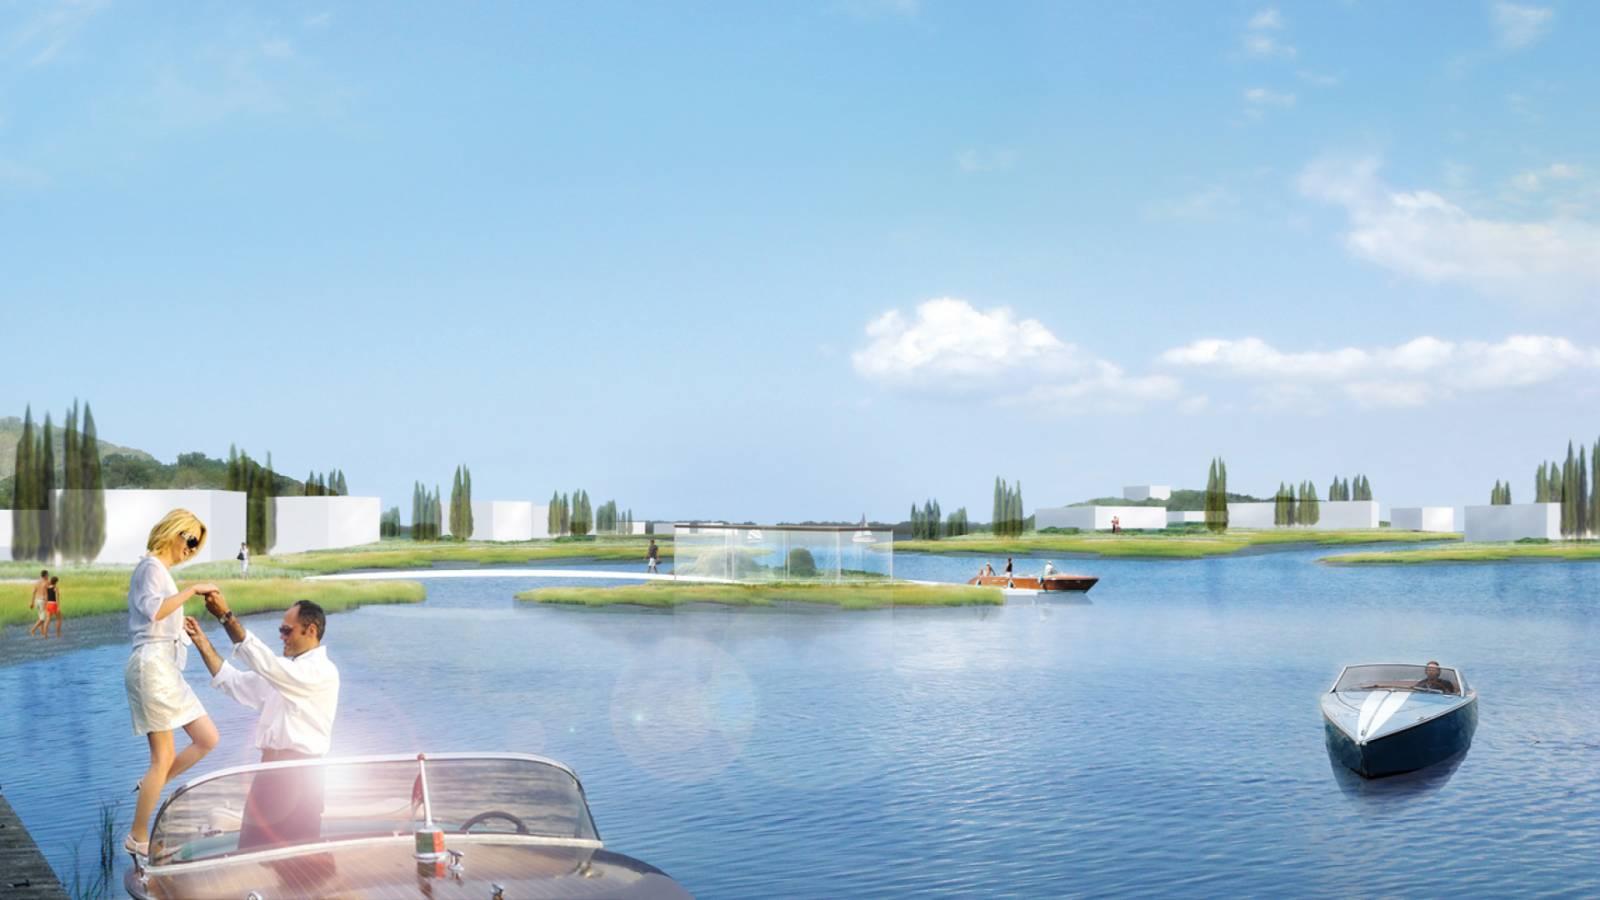 LUXURY VILLAGE VIEW - Velika Plaza Masterplan - SPOL Architects